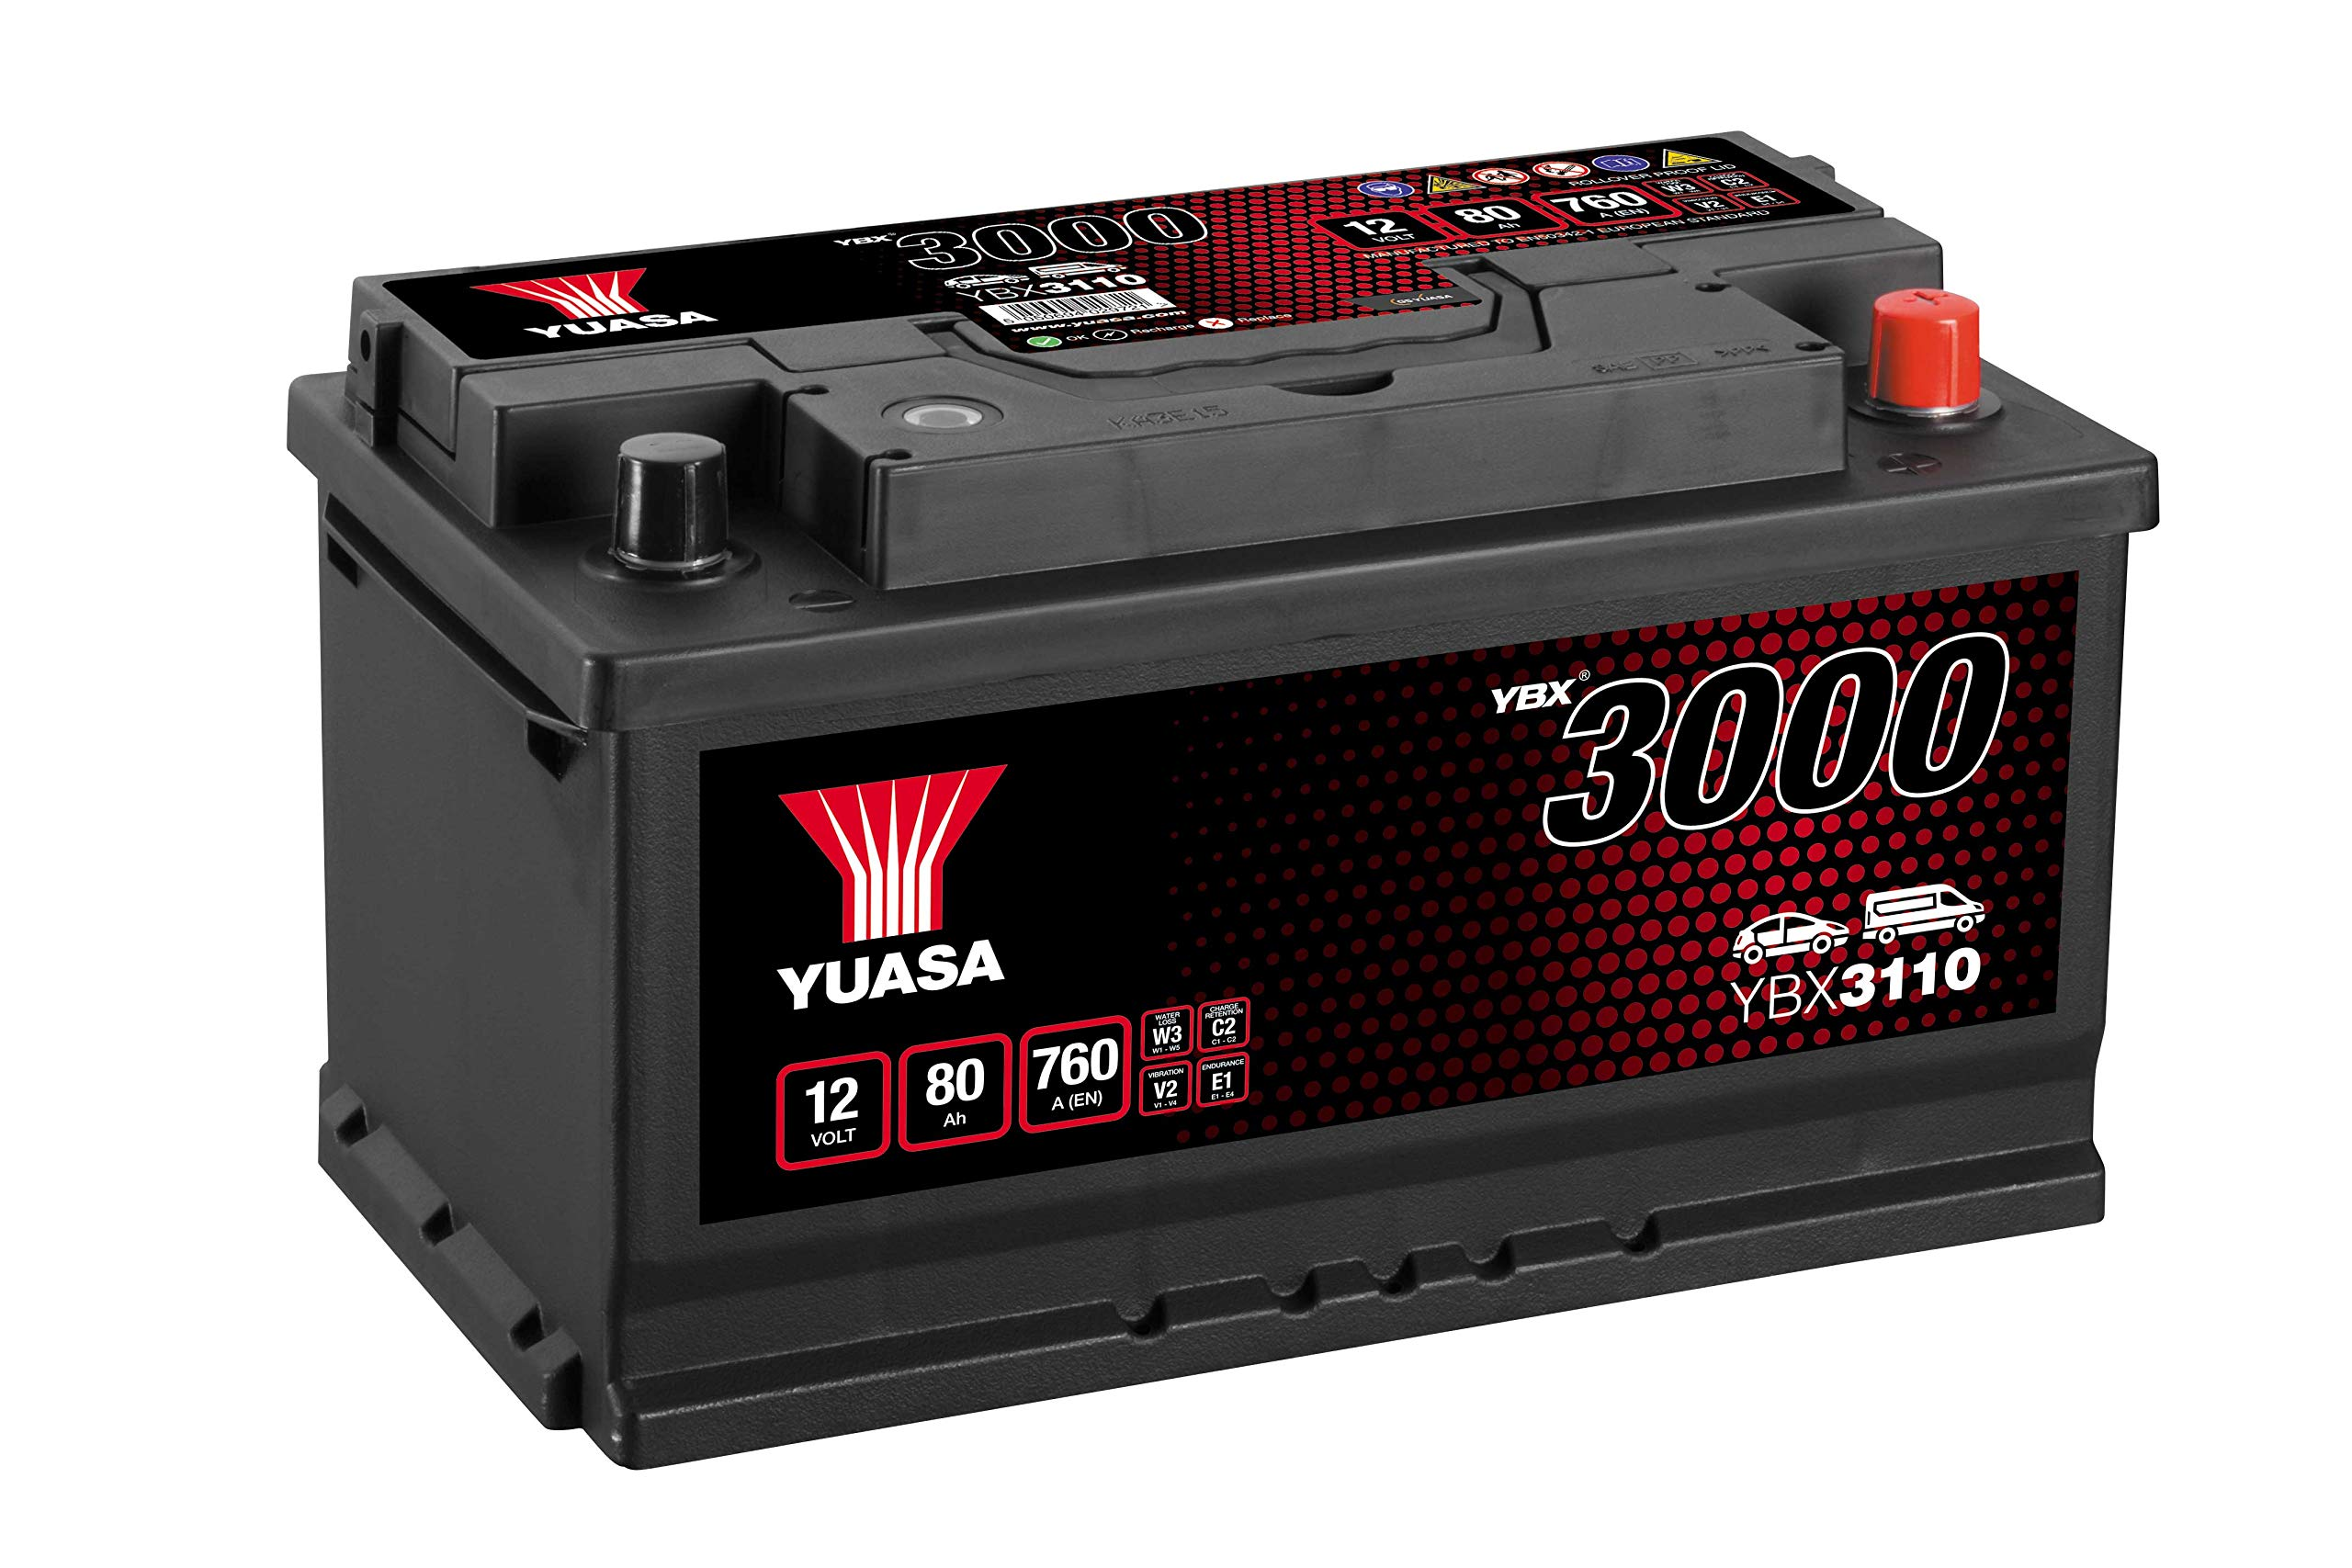 Yuasa YBX3110 12V 80Ah 720A SMF Battery